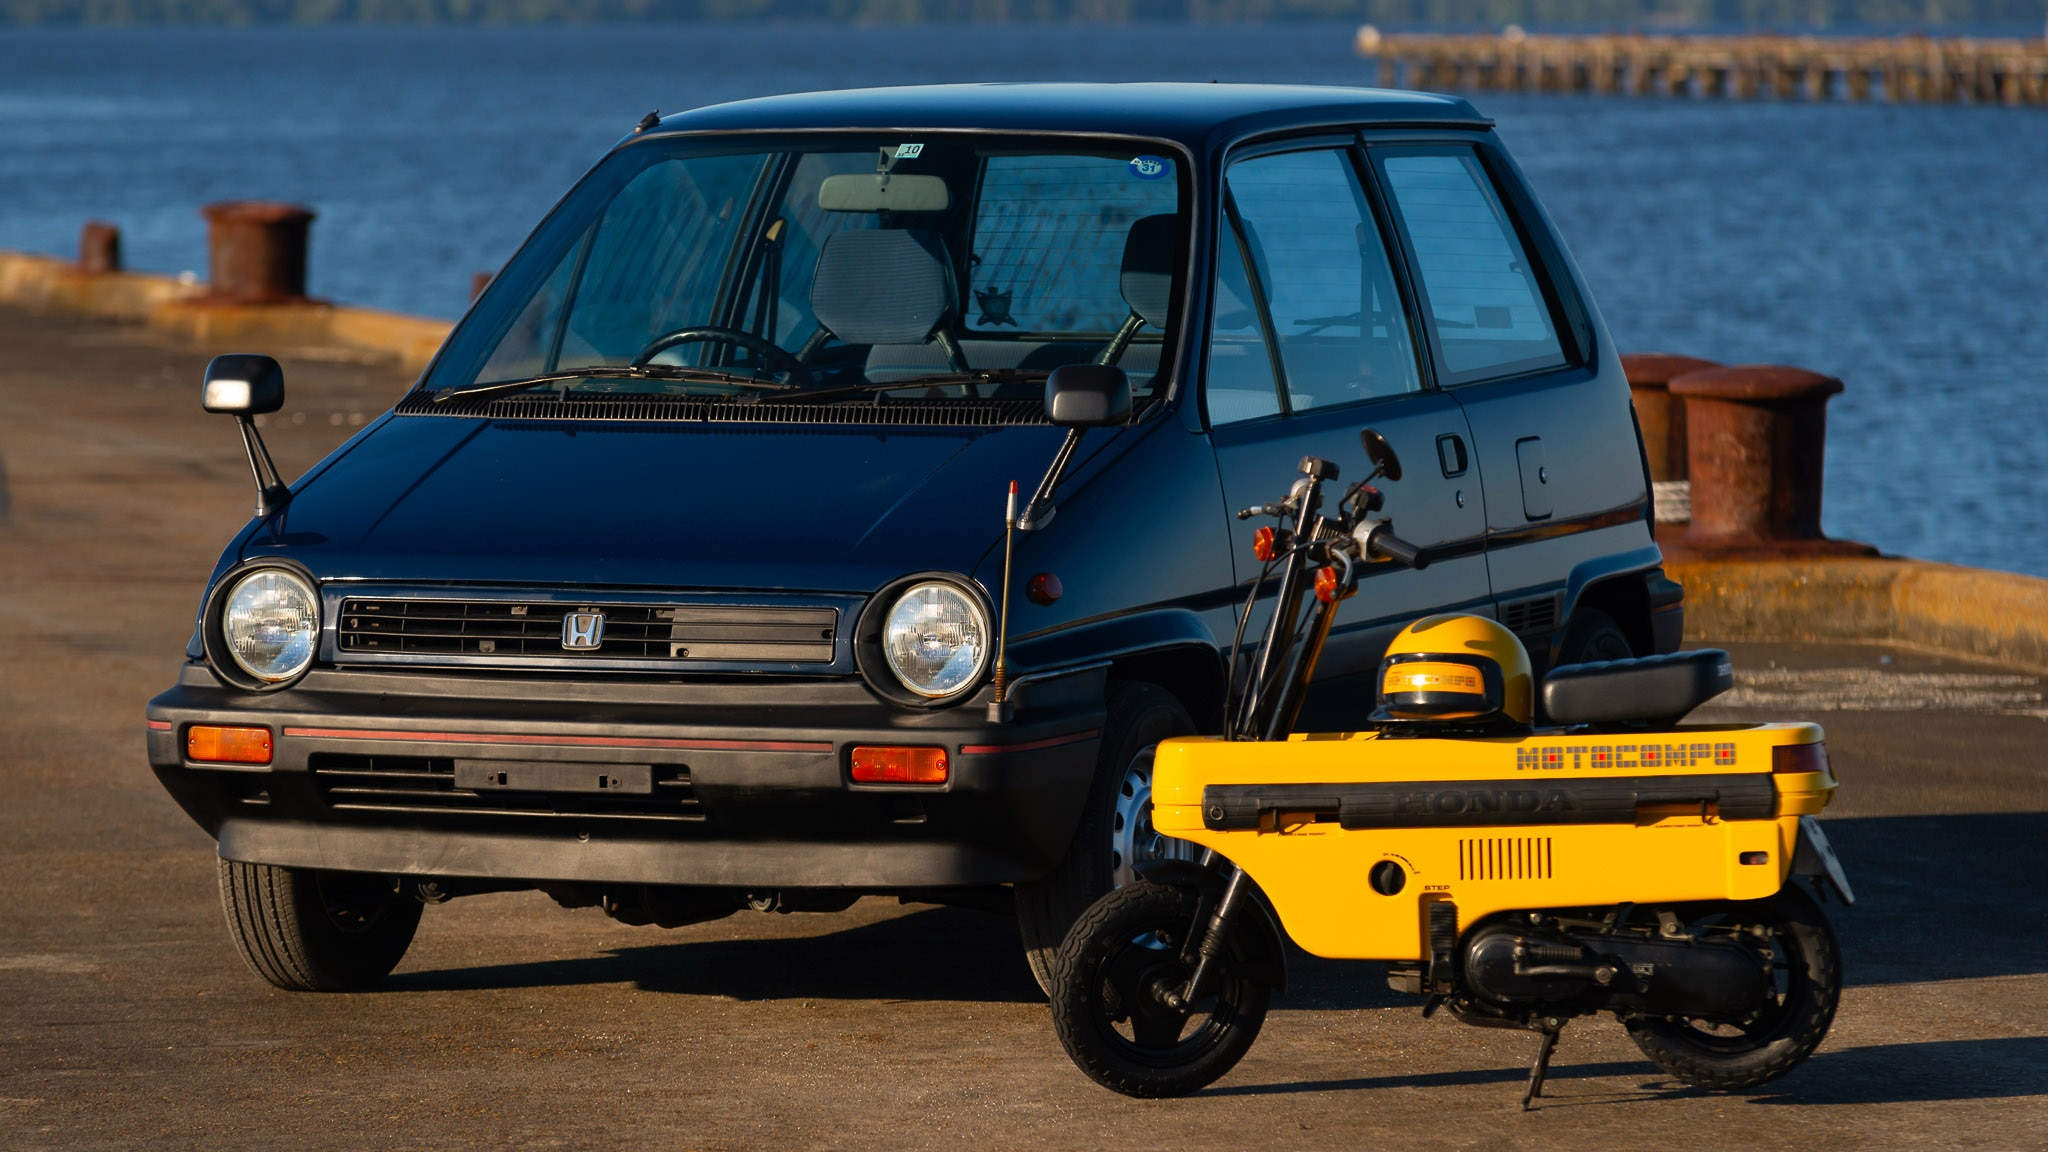 1984 Honda City Motocompo 11.'